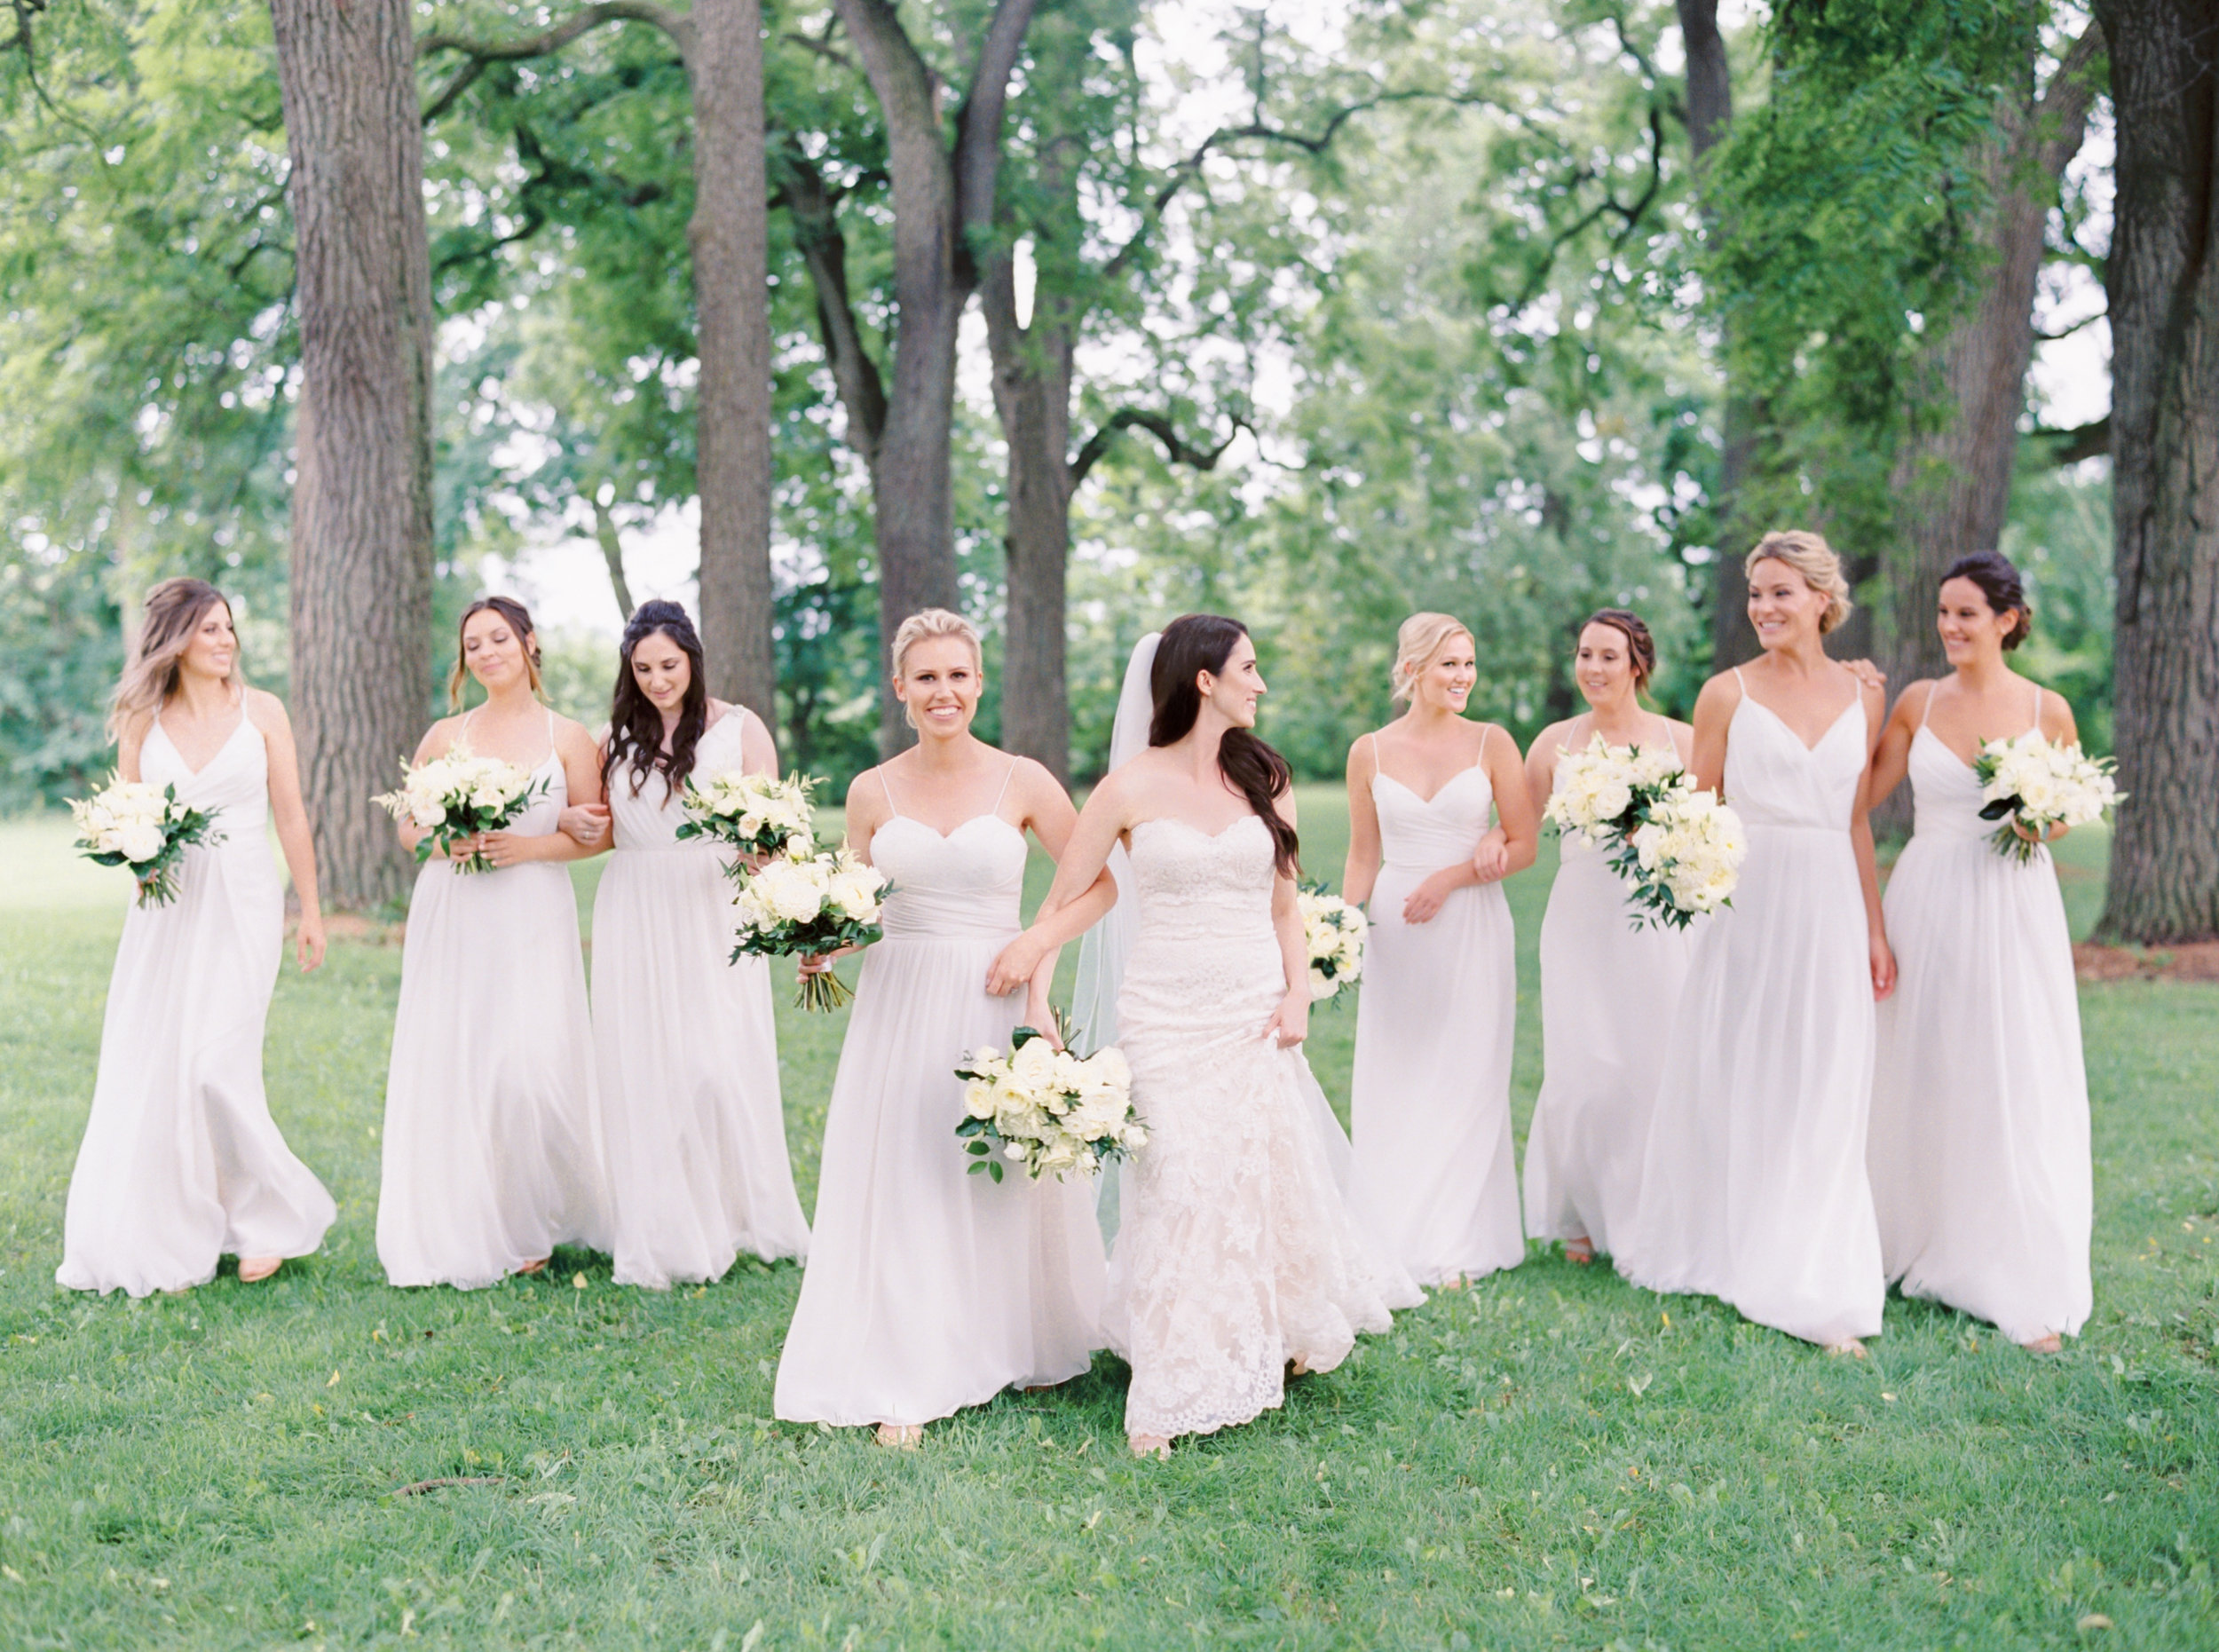 kurtz-wedding-toronto-photographer-langdon-film-richelle-hunter-anna-rob-previews-20.jpg